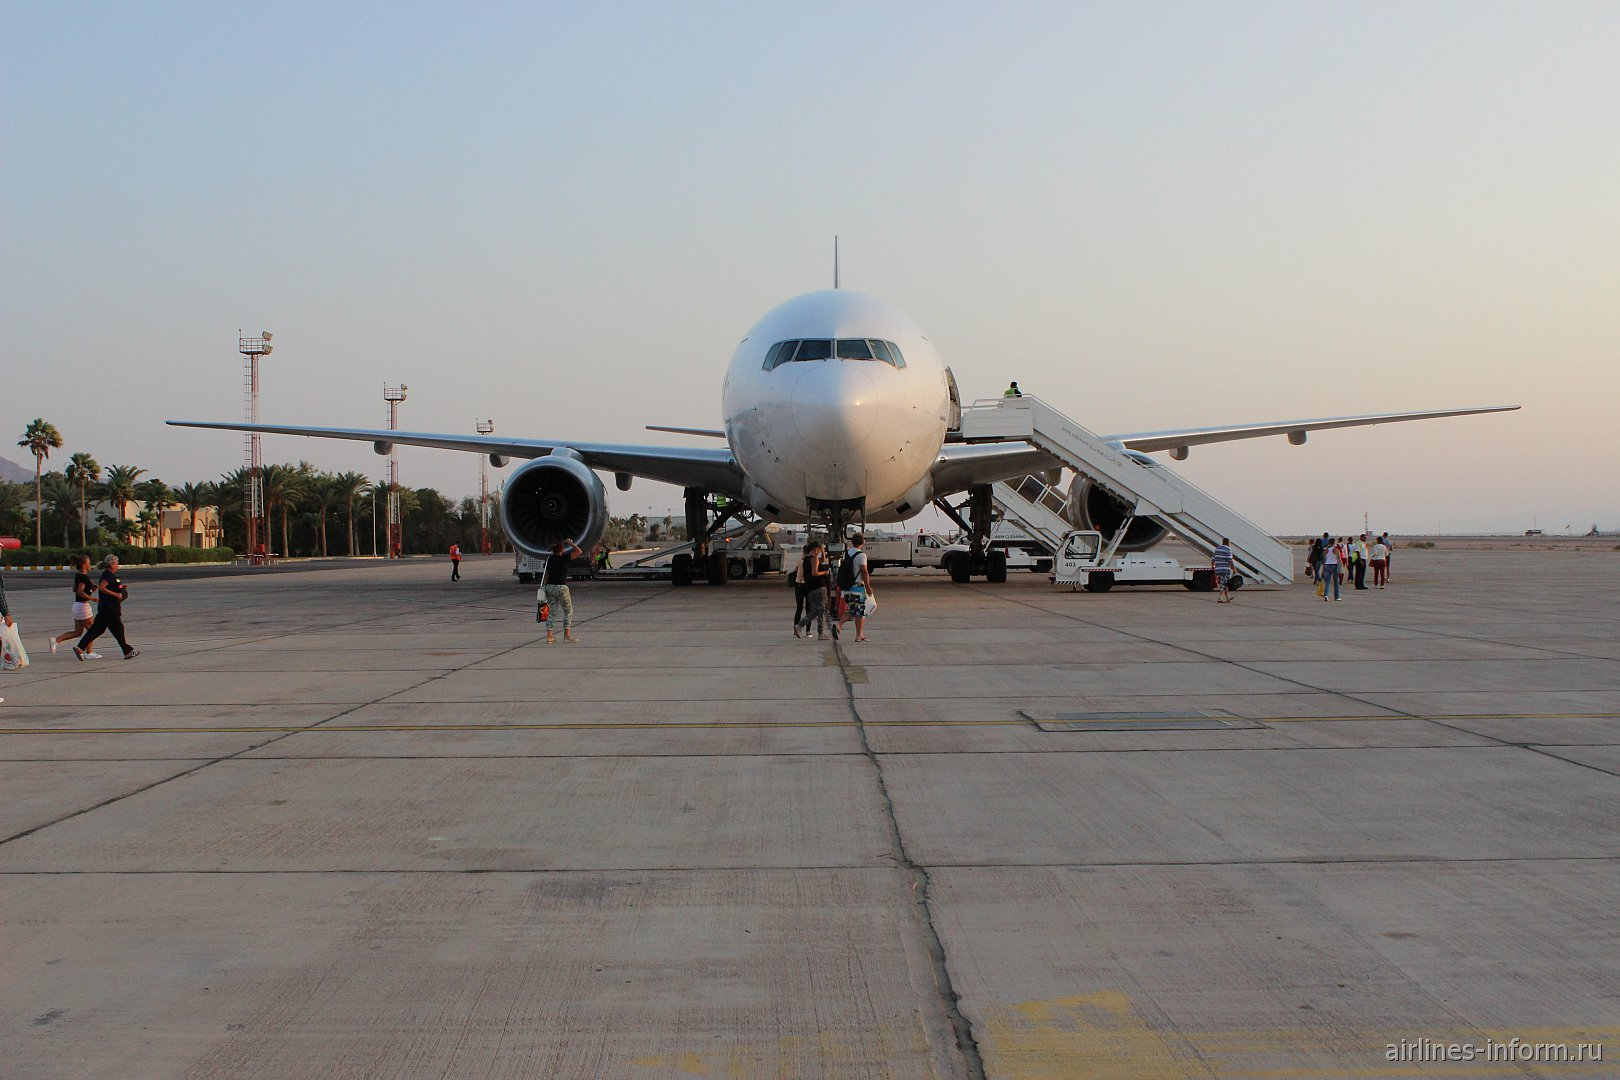 Летний отпуск. Часть 5 - Aqaba (King Hussein - AQJ) - Moscow (Sheremetyevo E - SVO) с Nordwind Airlines на Б-777-200 (бизнес-класс)